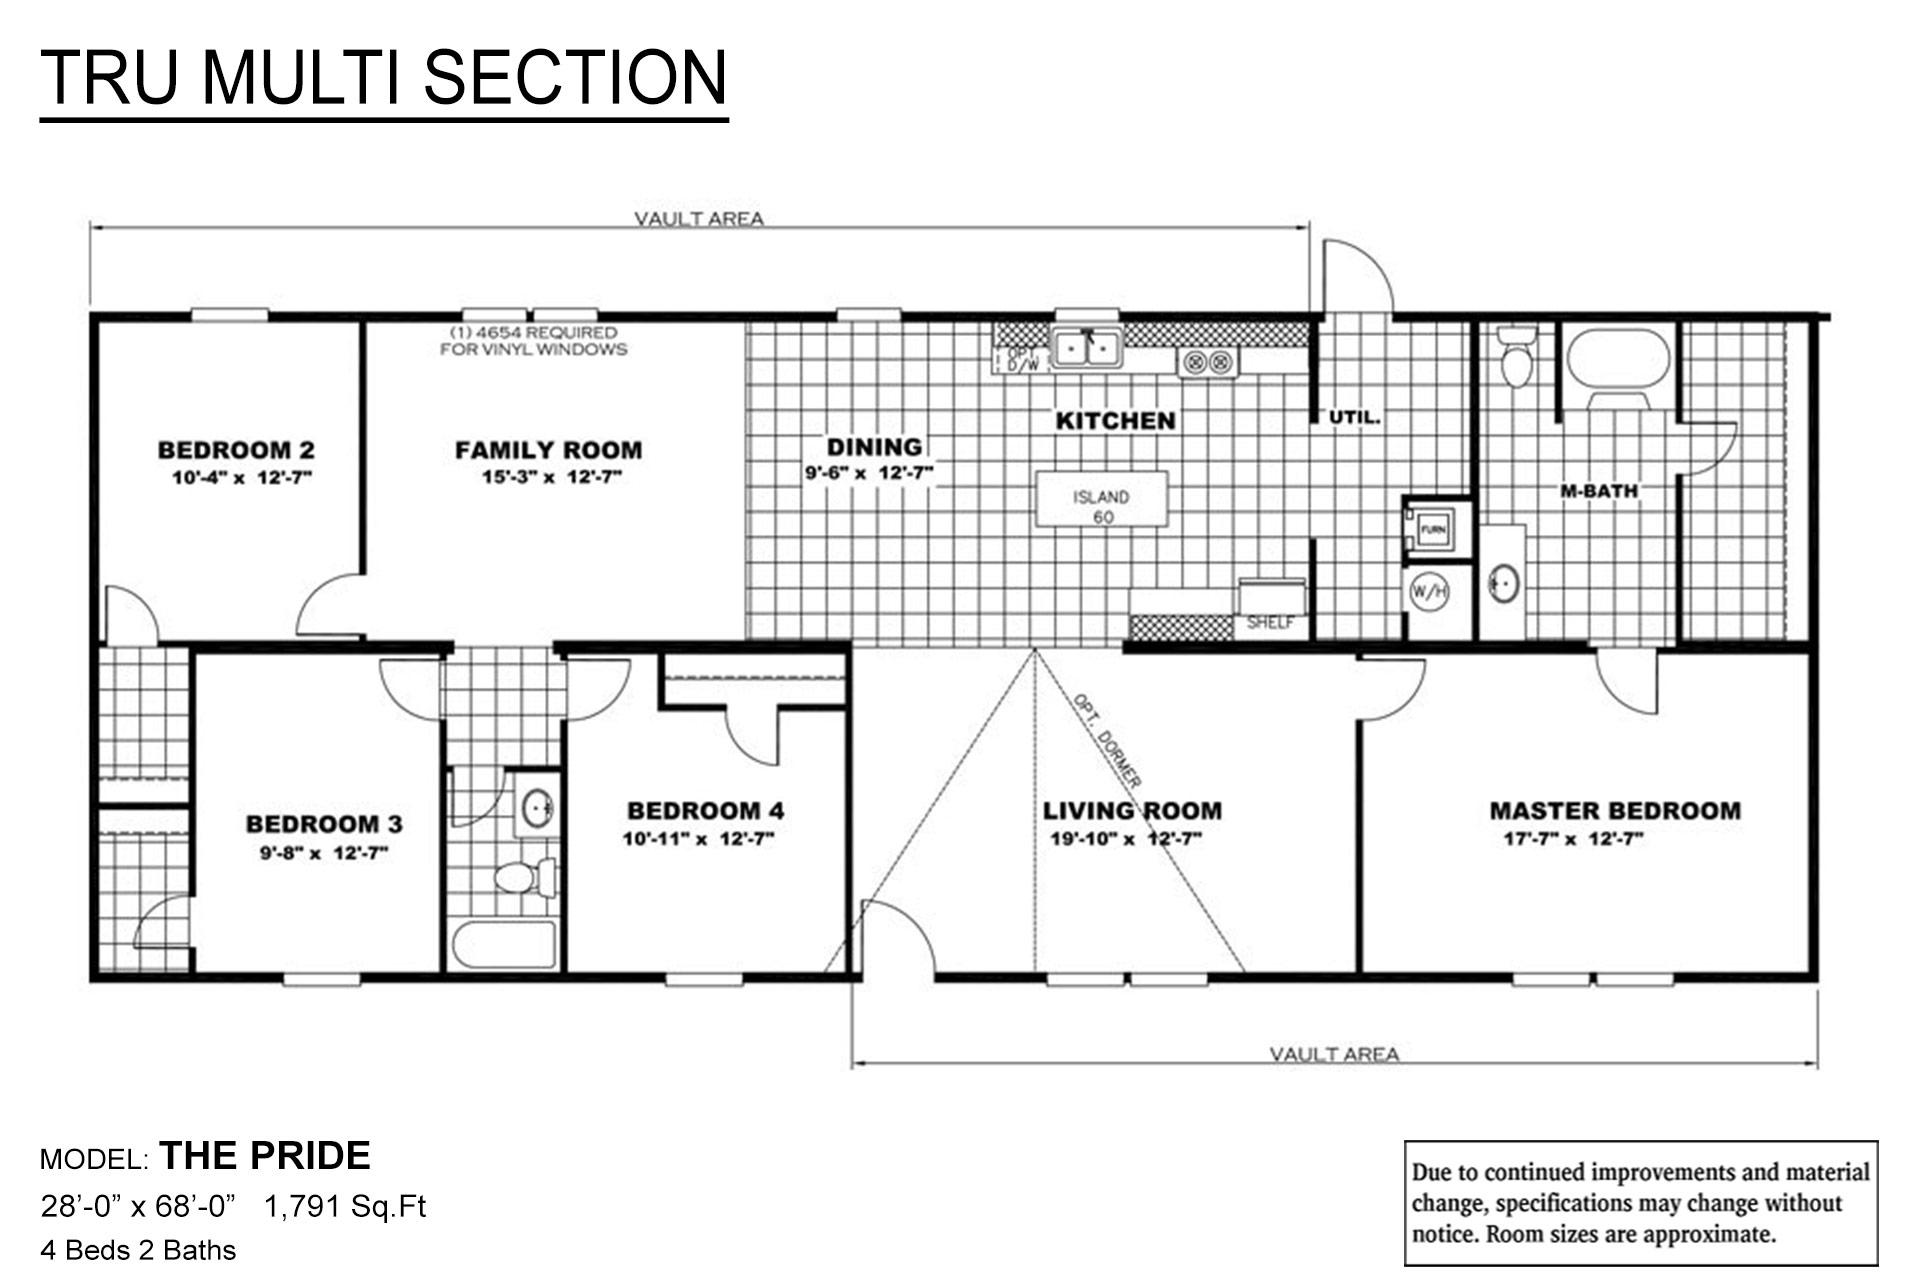 TRU Multi Section Pride Layout